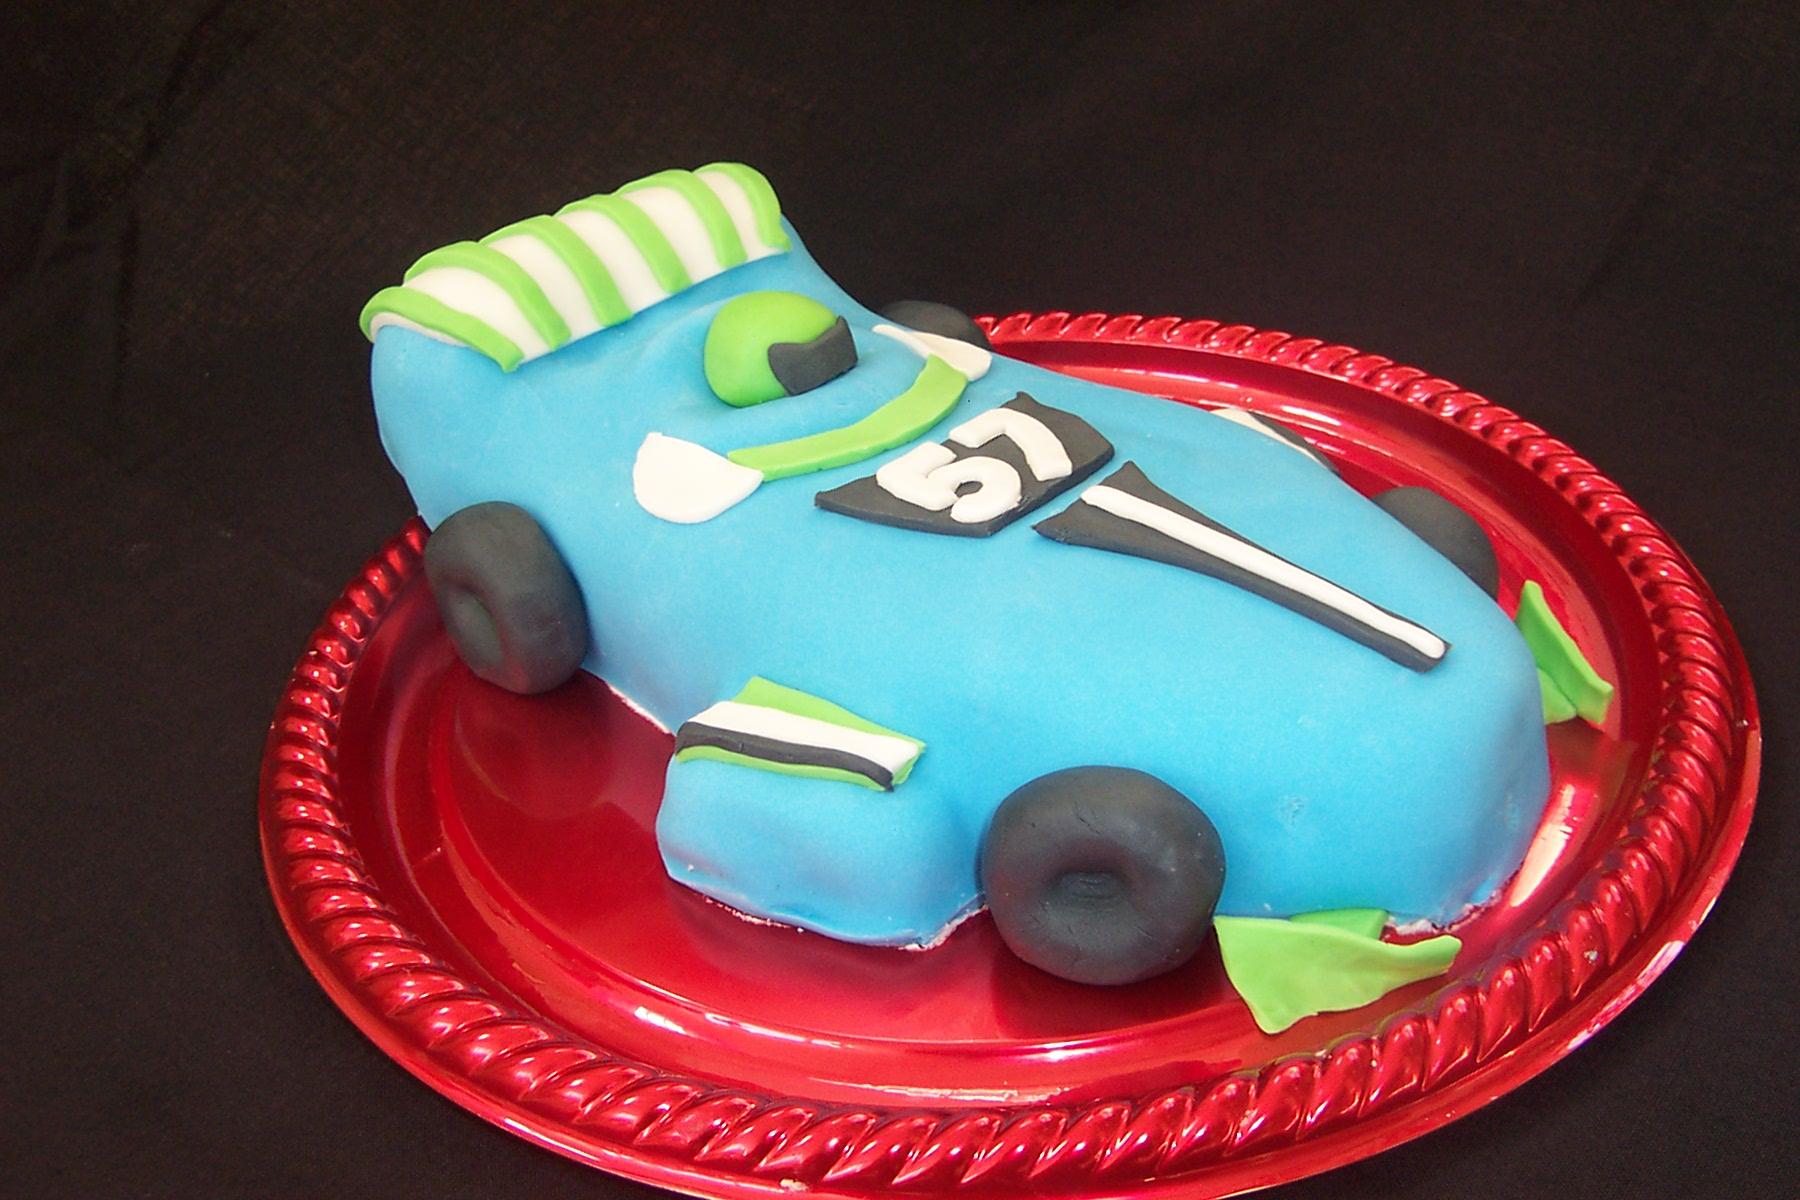 Racecar - Copy